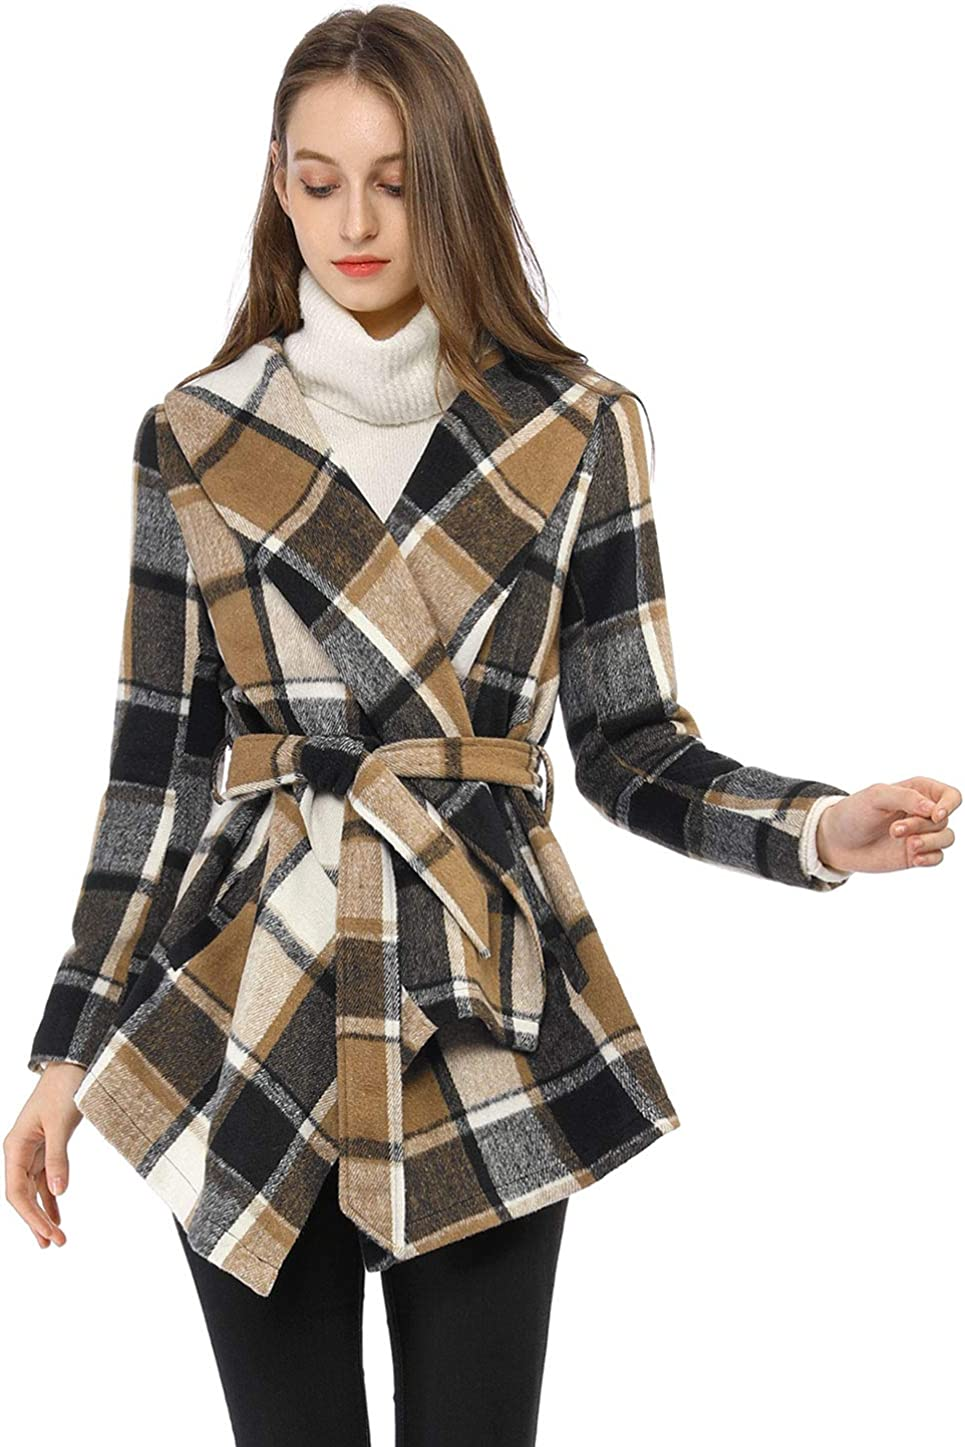 Allegra K Womens Turn Down Collar Asymmetric Hem Thin Plaids Wrap Coat